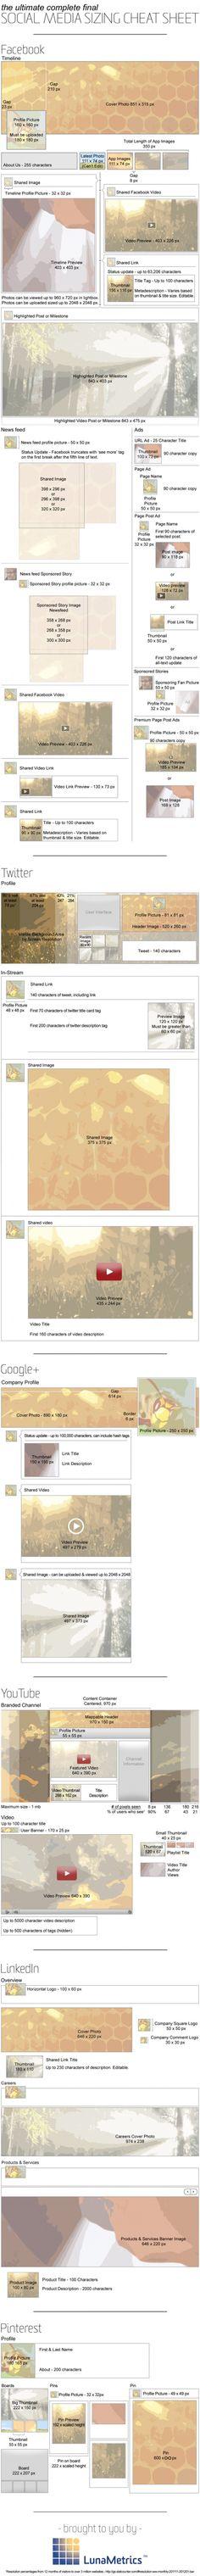 Image cheat sheet (Facebook, Twitter, G+, YouTube, LinkedIn, Pinterest) - new version